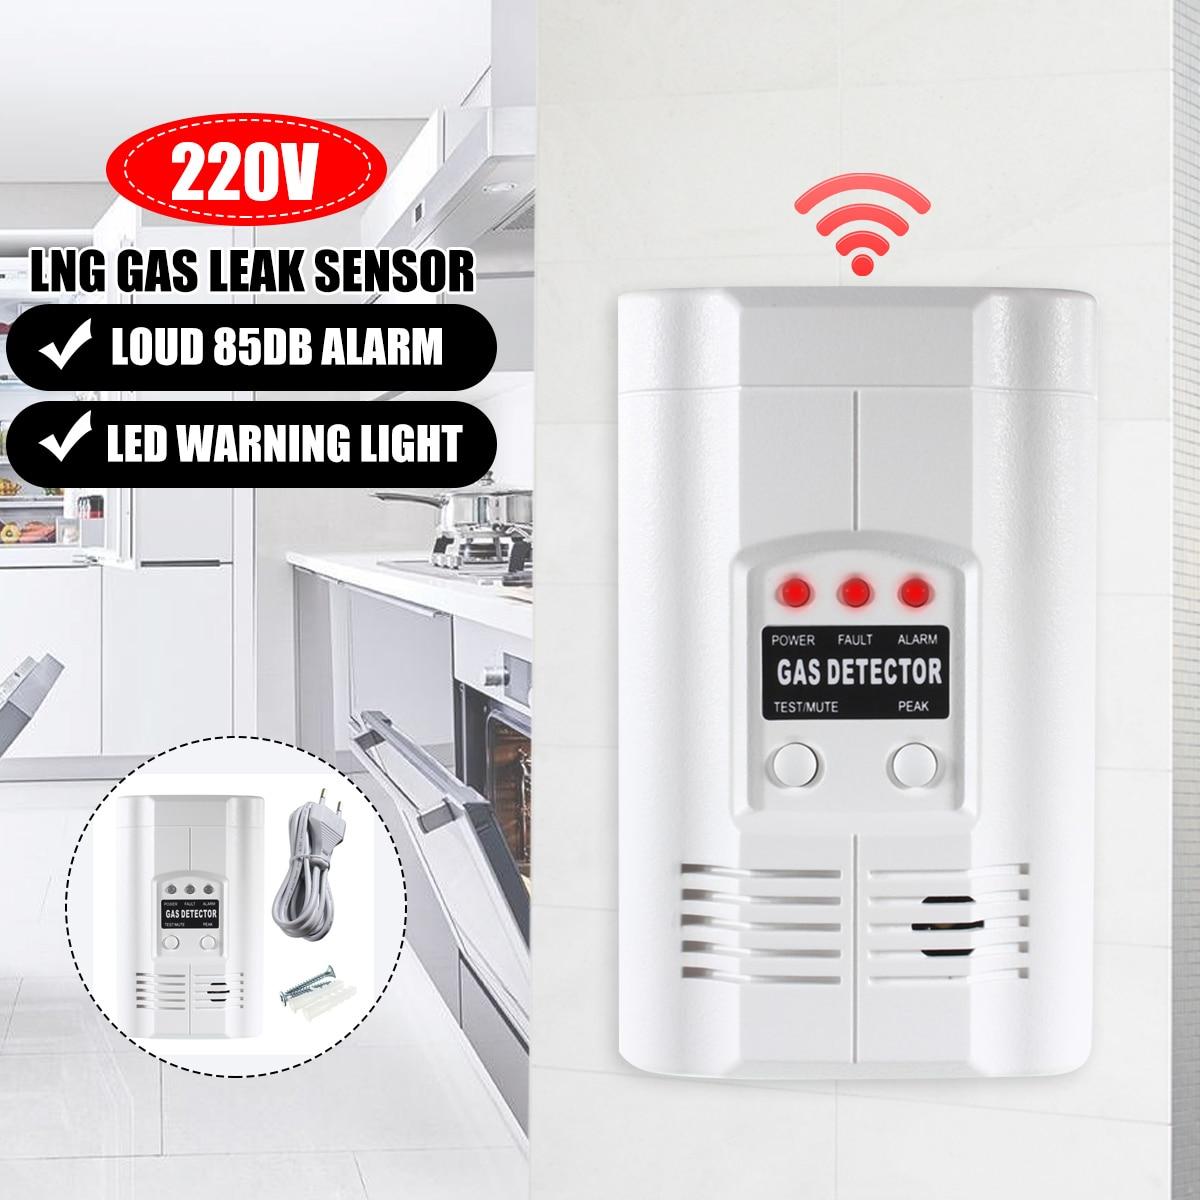 Sensitivity Gas Leak Detector Sensor Alarm Digital Combustible Gas Detector Natural Propane Lpg LNG Gas Leak Home Warn Tester